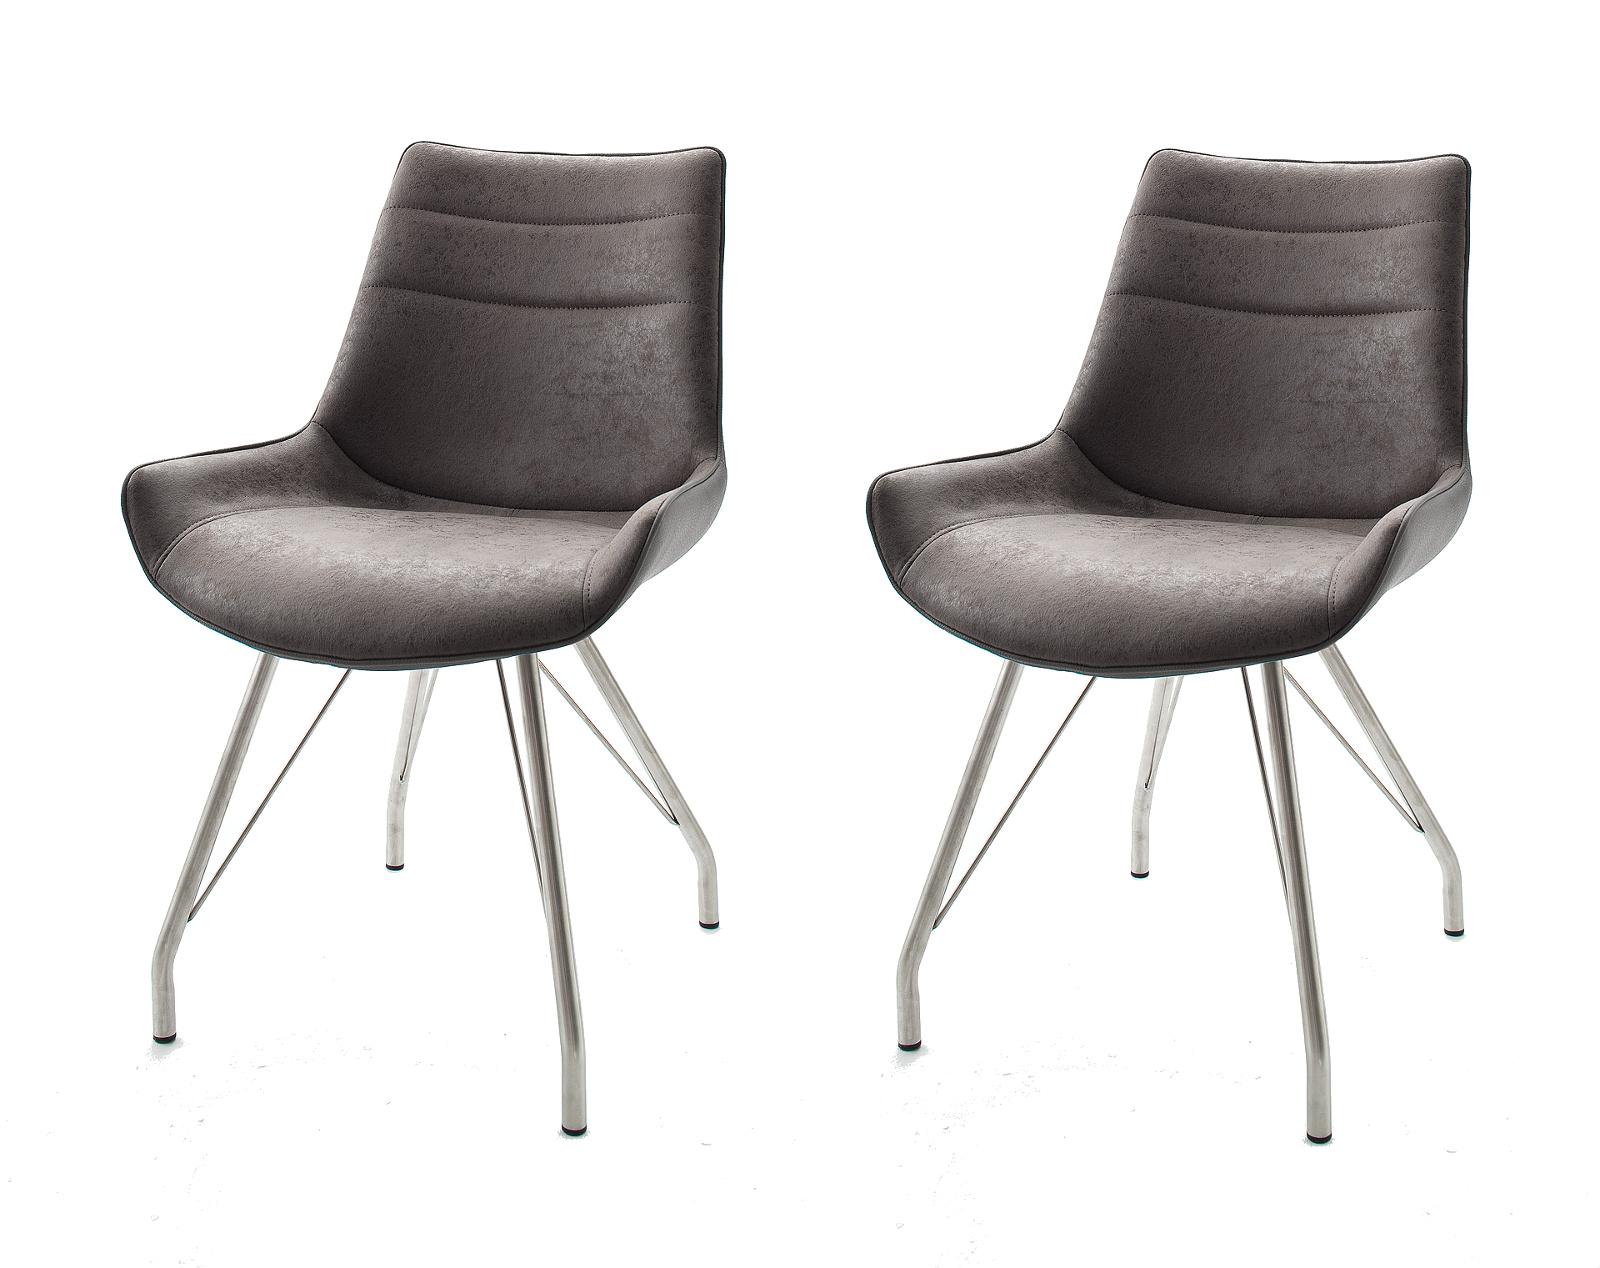 2 x Stuhl Danita in Grau Vintage Kunstleder und Edelstahl 4 Fuß Gestell Esszimmerstuhl 2er Set Schalenstuhl